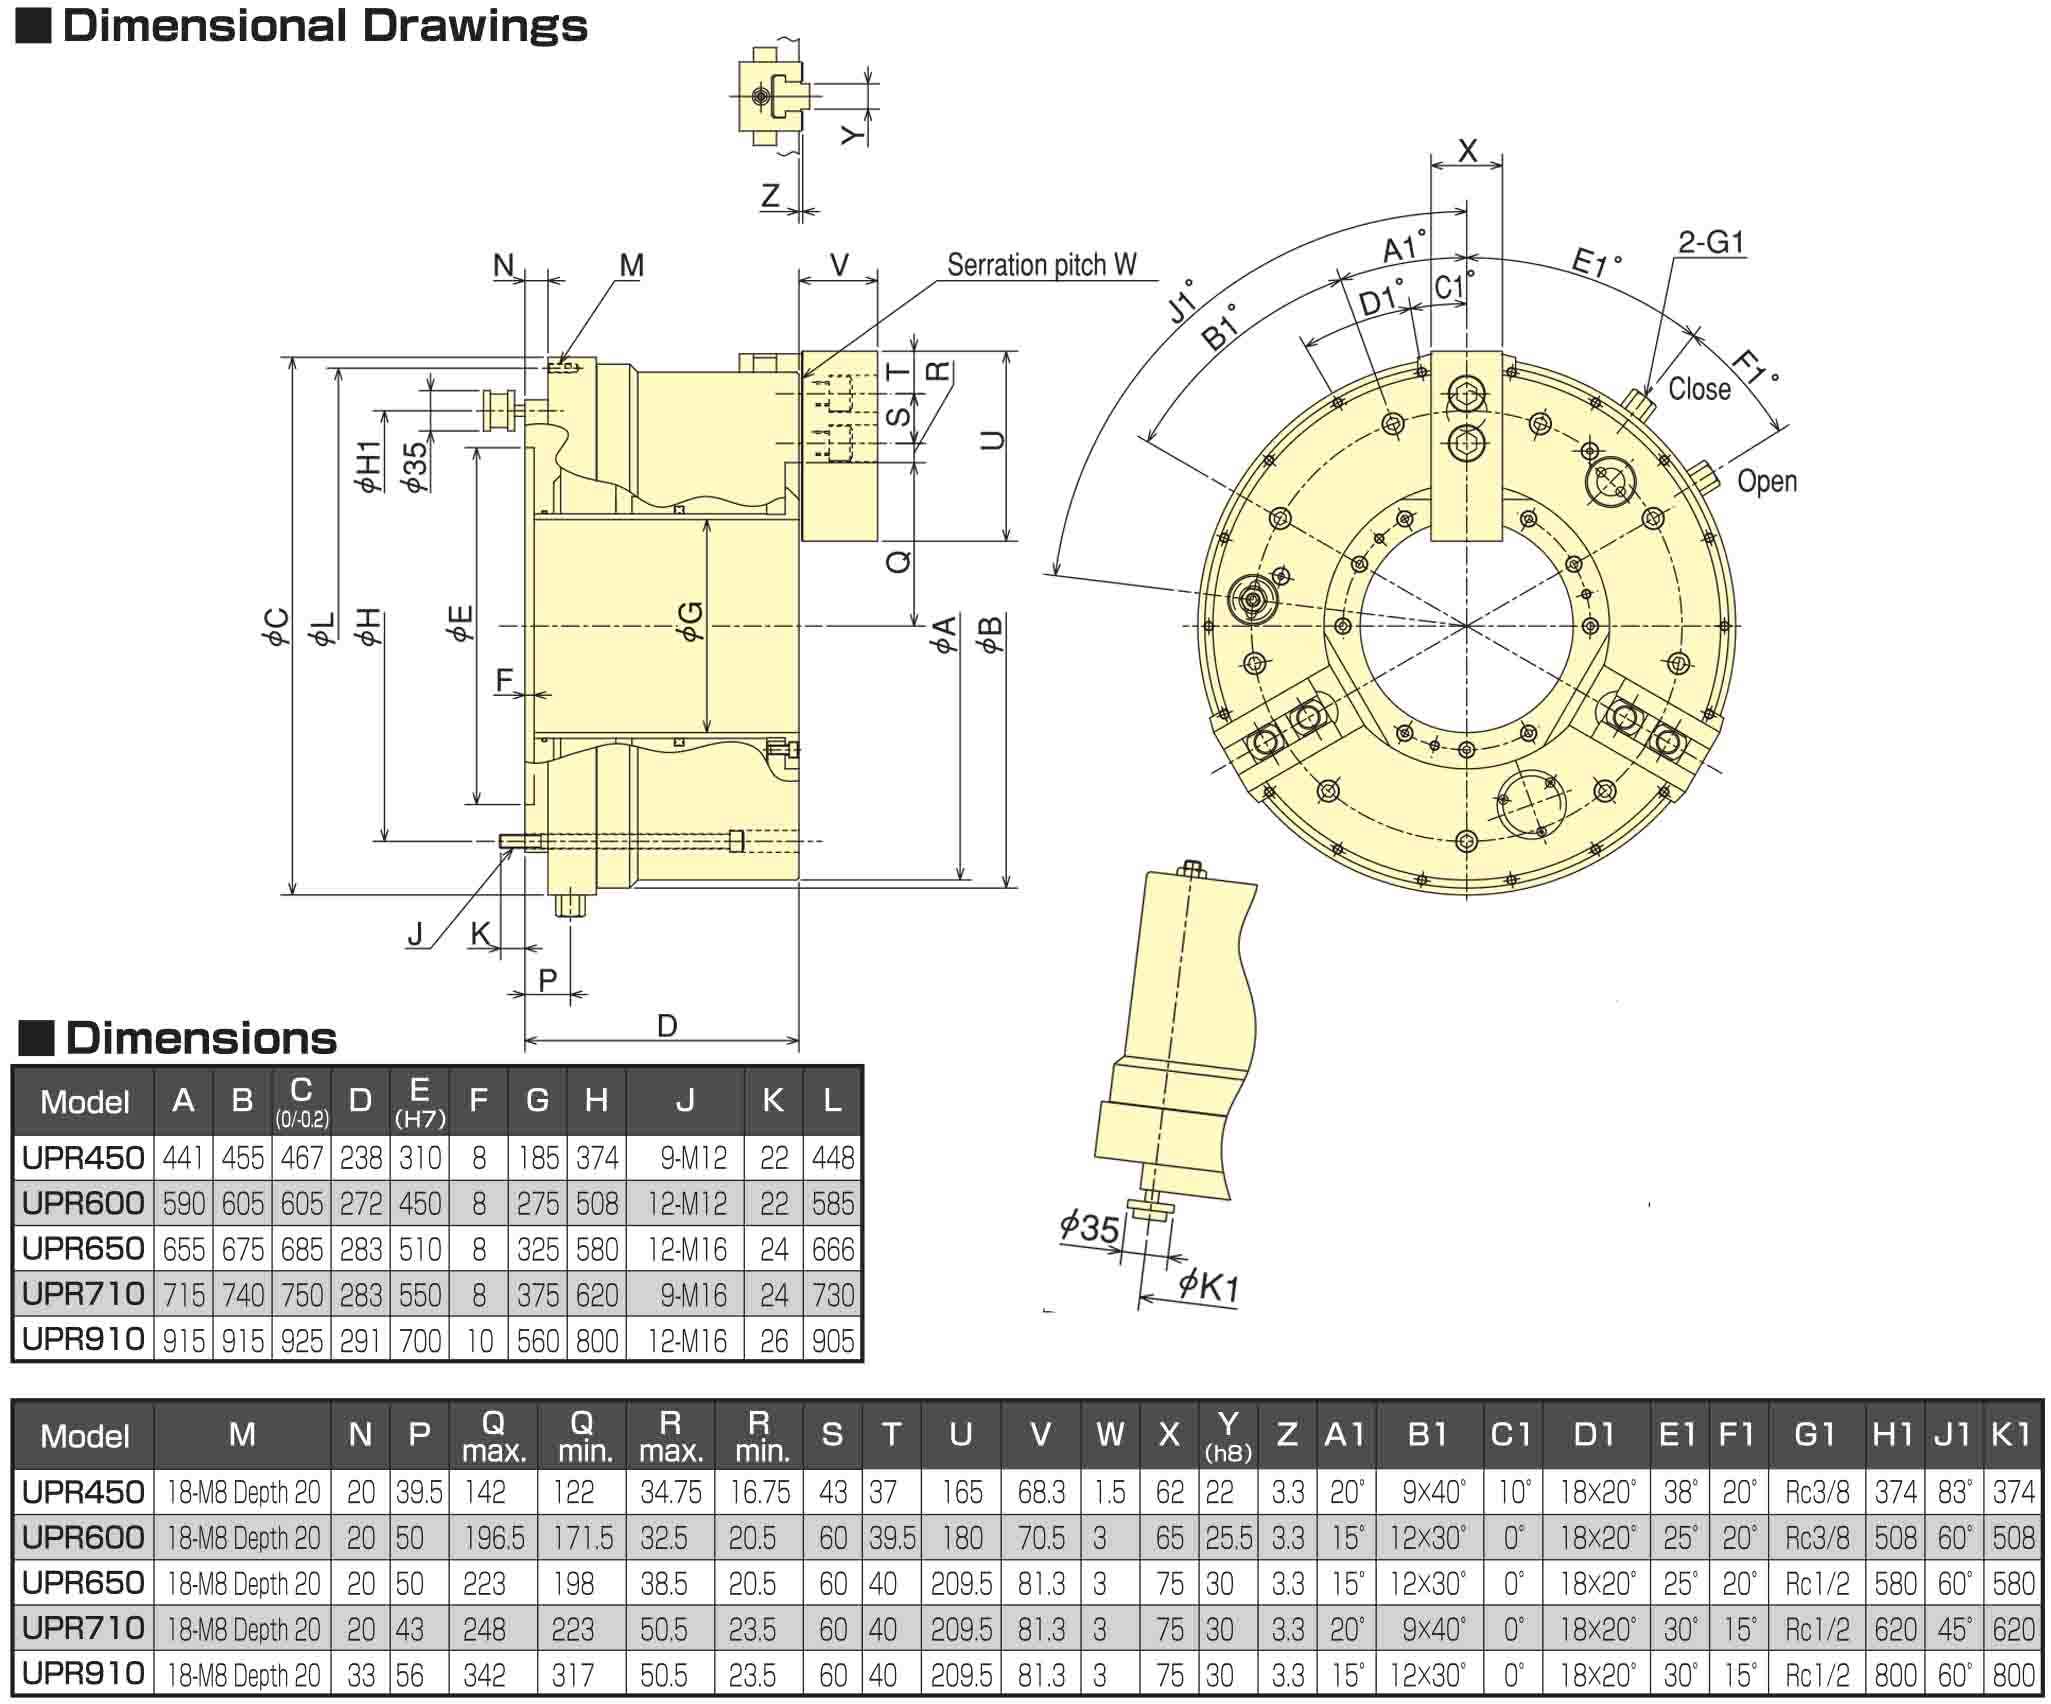 Kitagawa UPR650 Air-Operated Chuck Dimensional Drawings